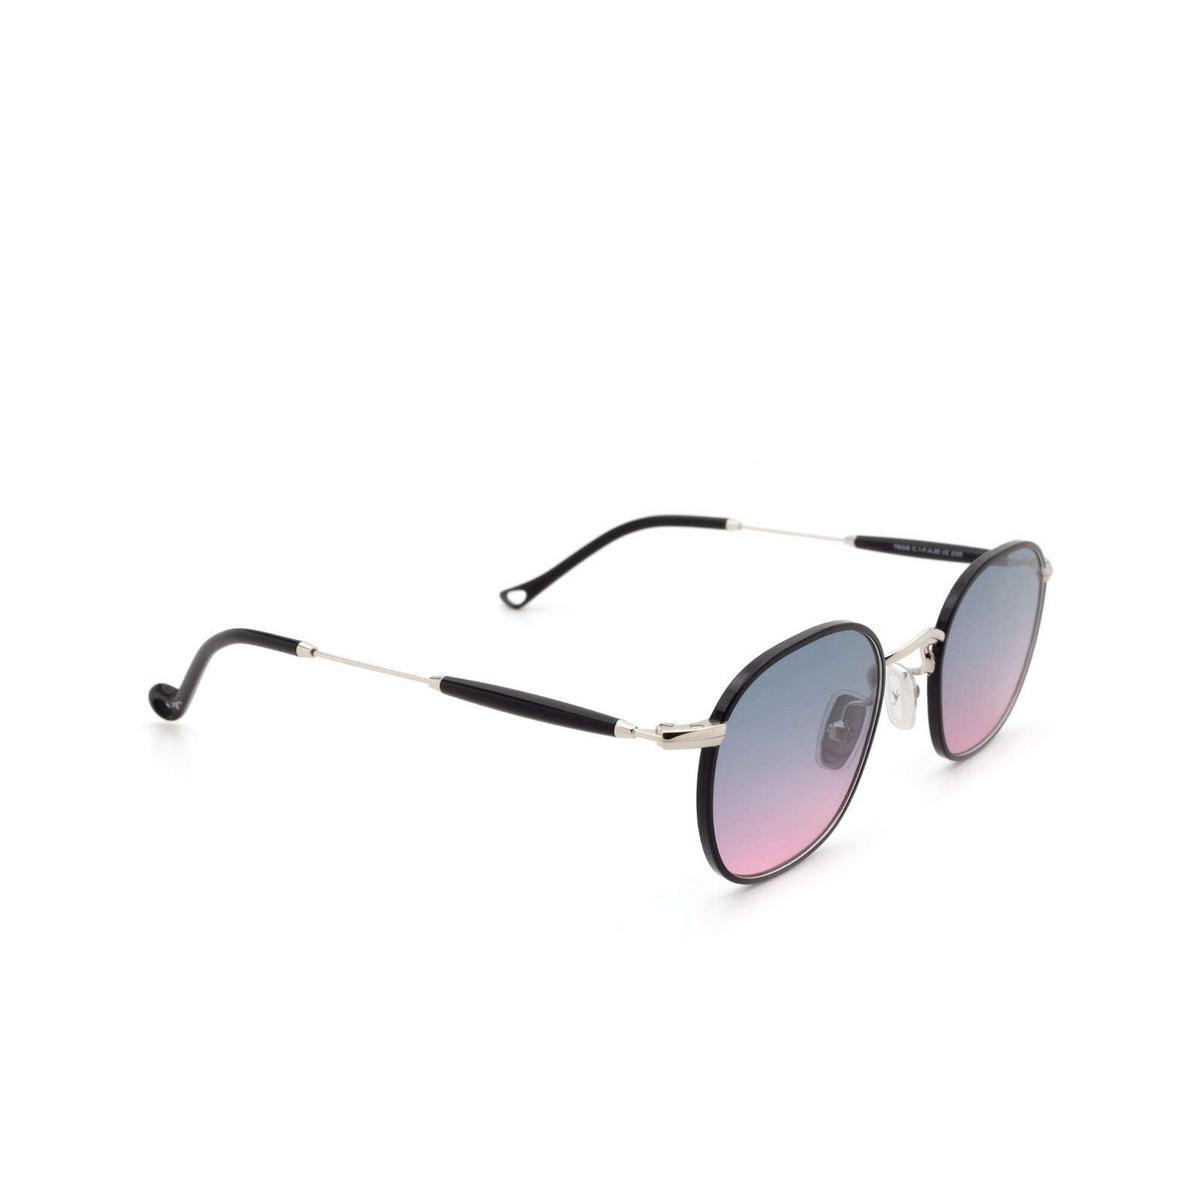 Eyepetizer® Square Sunglasses: Trois color Black C.1-F-A-20 - three-quarters view.